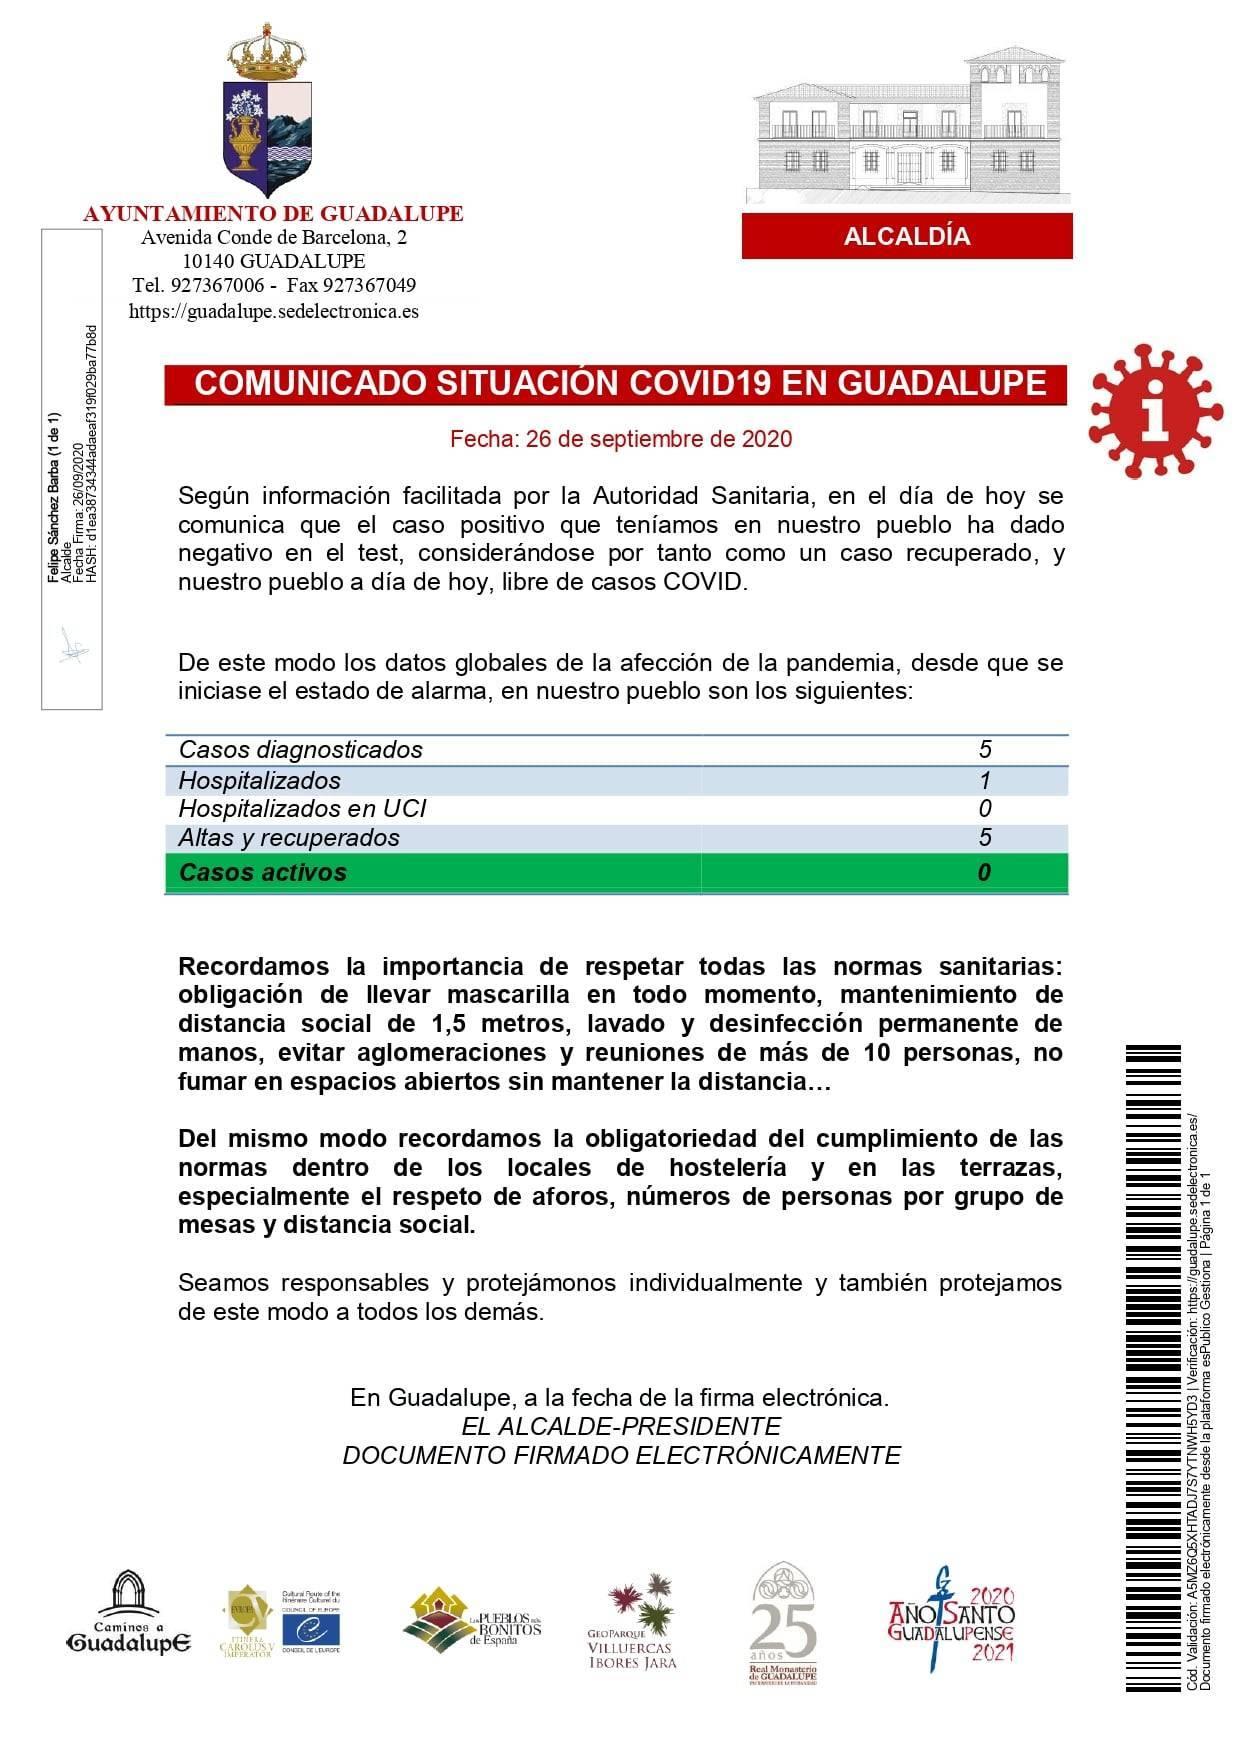 Ningún caso activo de COVID-19 (septiembre 2020) - Guadalupe (Cáceres)